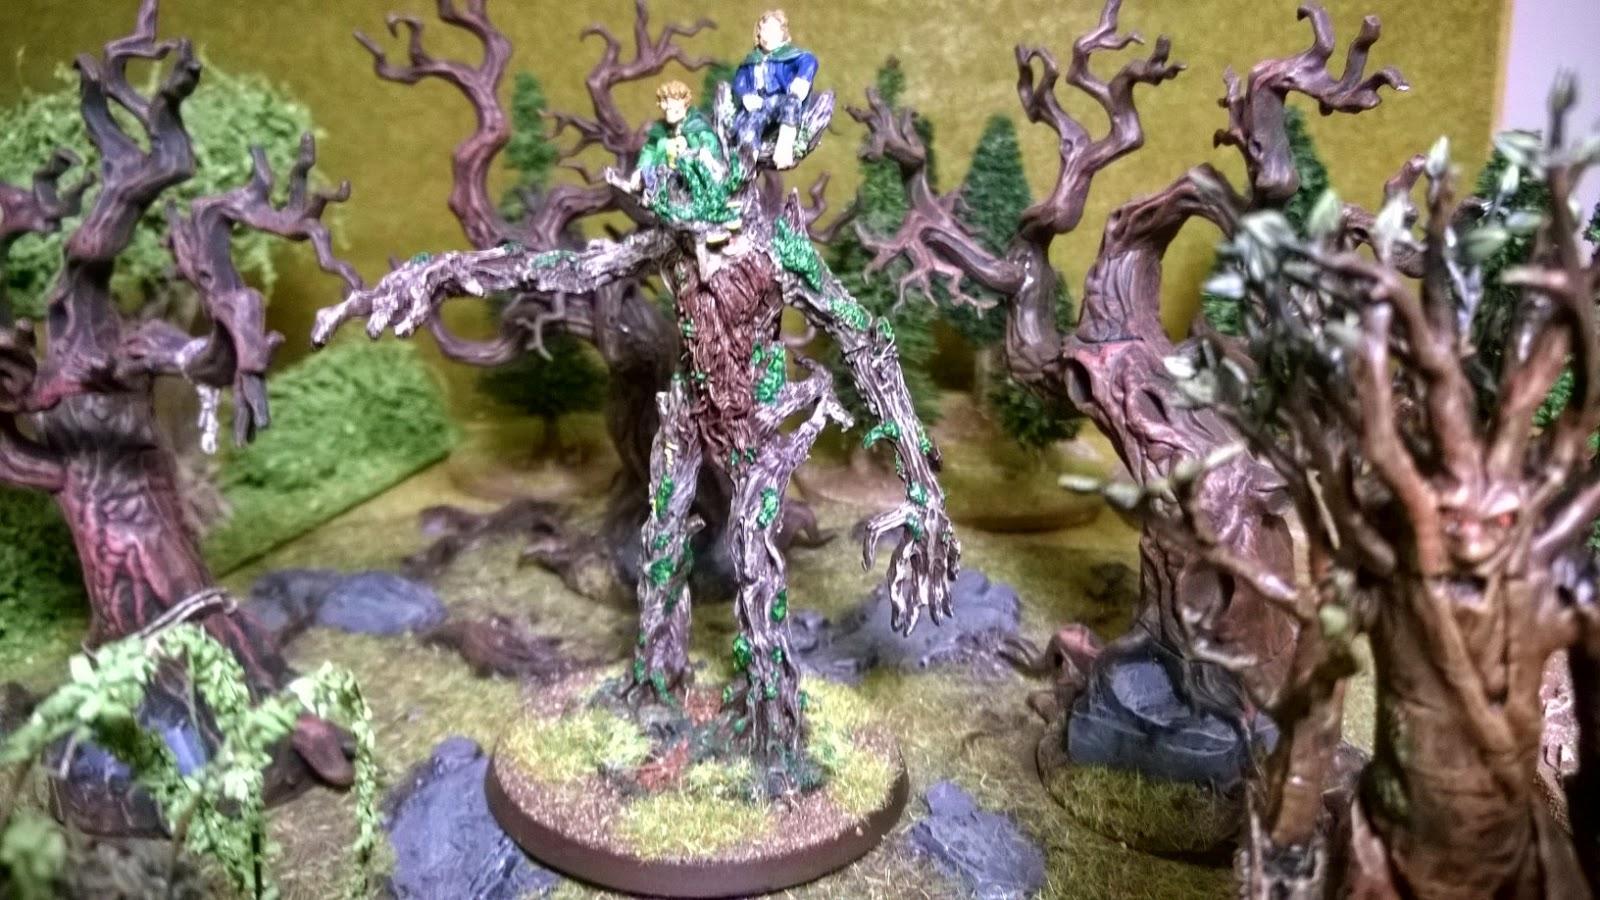 lotr treebeard model miniature ent